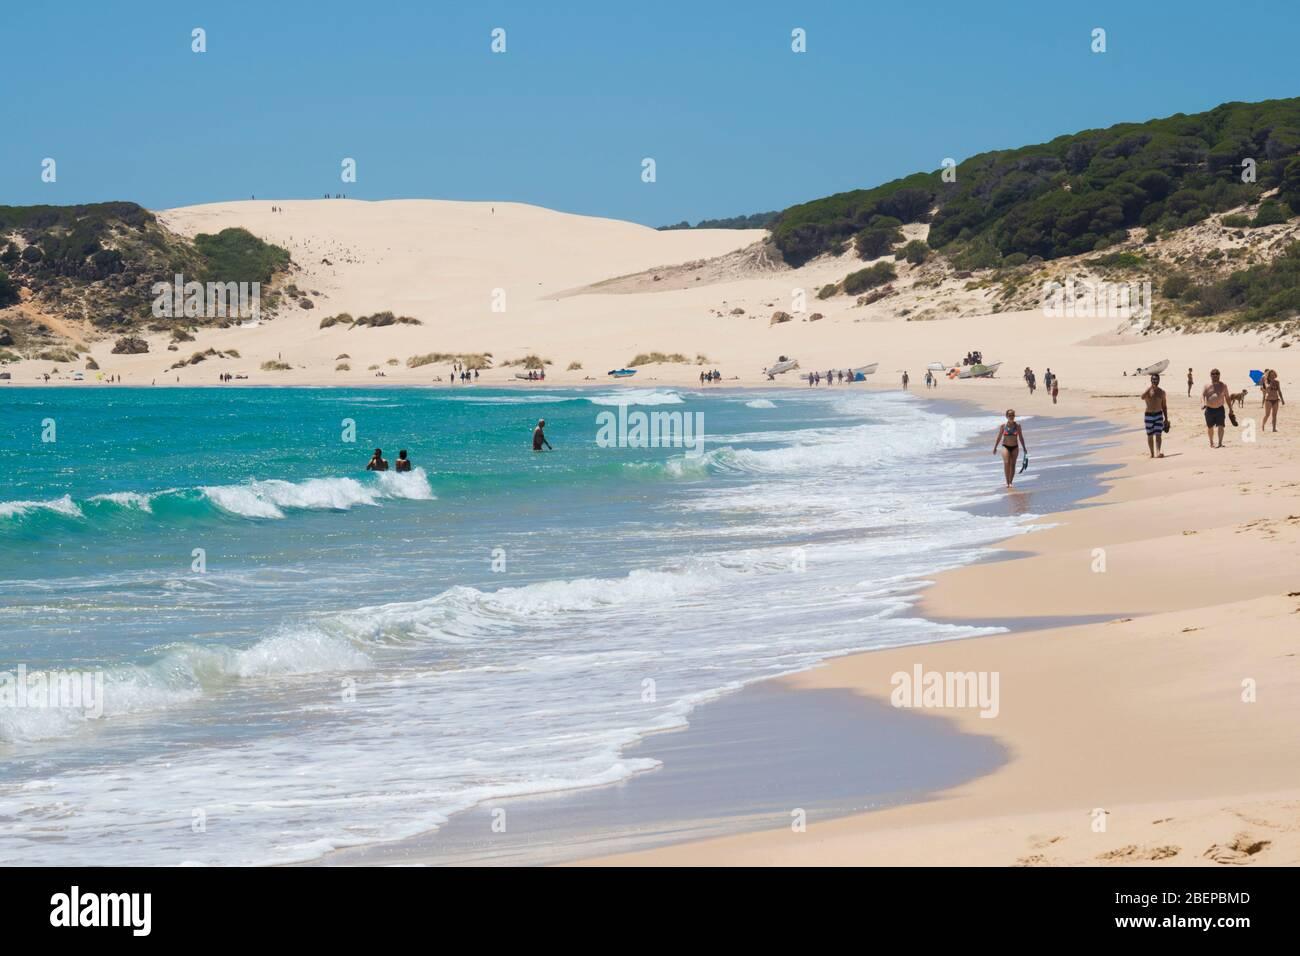 Bolonia, Costa De La Luz, Provinz Cadiz, Andalusien, Südspanien.  Bolonia Beach.  Playa de Bolonia.  Im Hintergrund ist die Bolonia Sanddüne, o Stockfoto